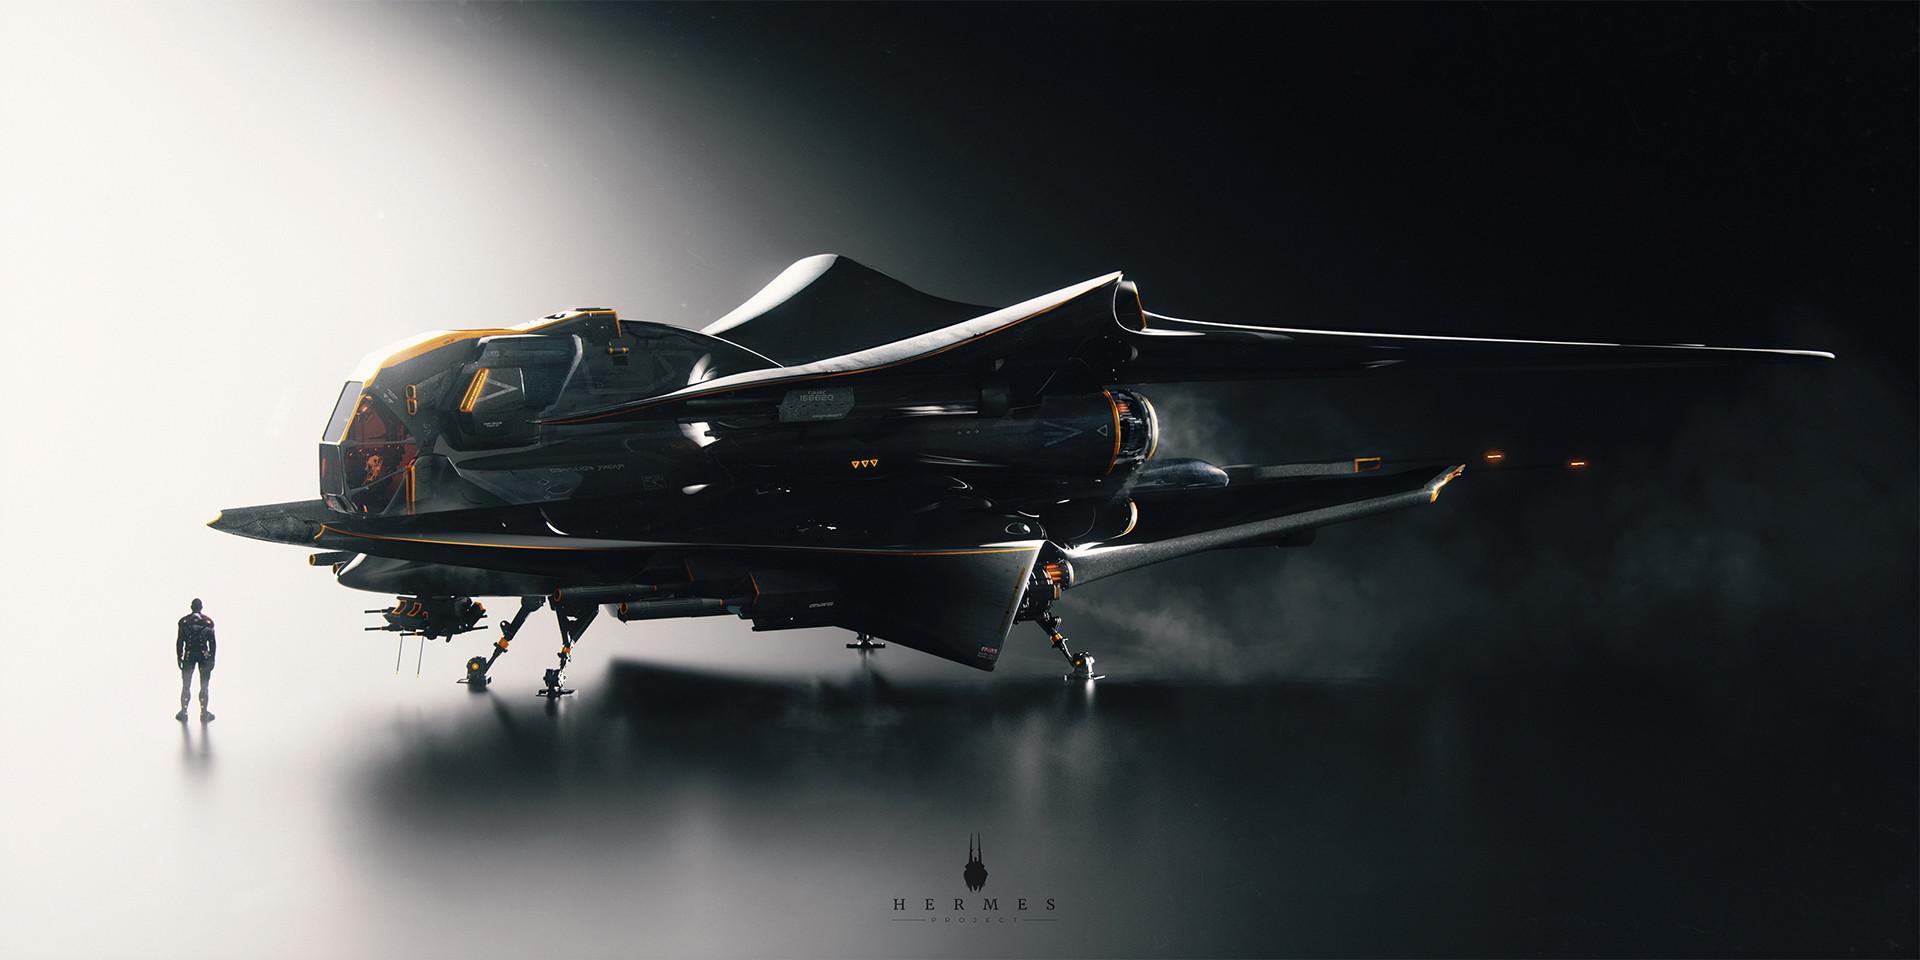 wojtek-fus-hermes-project